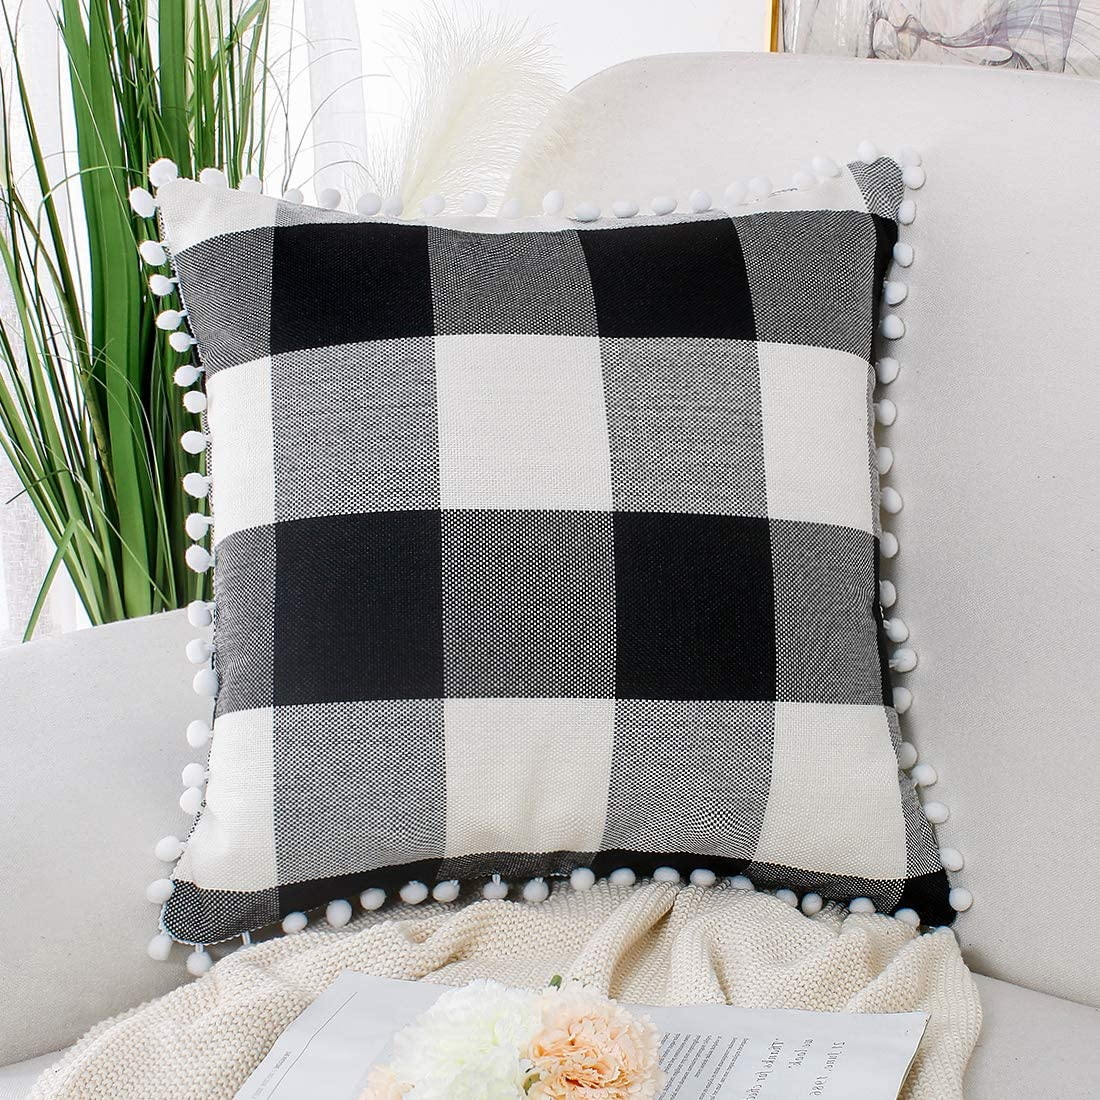 PiccoCasa Buffalo Check Plaid Throw Pillow Covers with Pom-poms, Classic Retro Plaid Cushion Covers, Decorative Sofa Pillow Covers for Home Decor, 18 x 18 Inch, Black Beige White